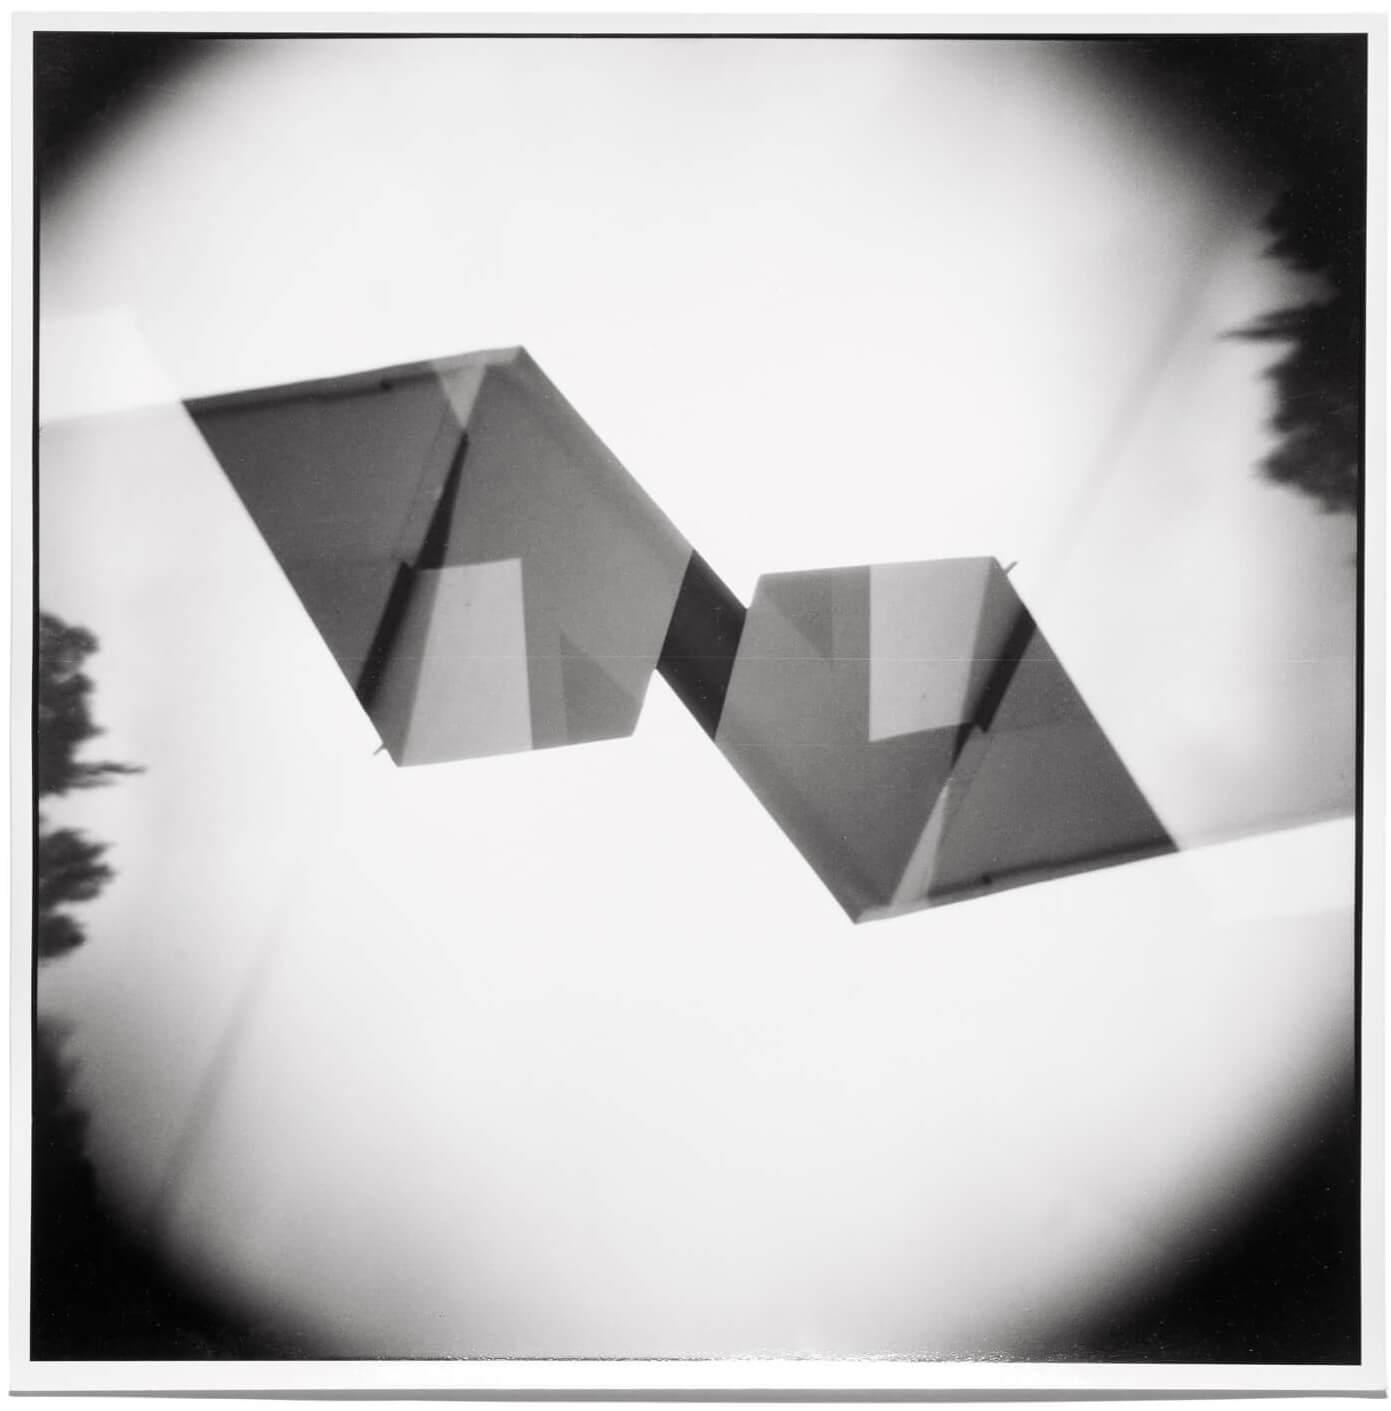 Untitled (Laszlo Series), 2012